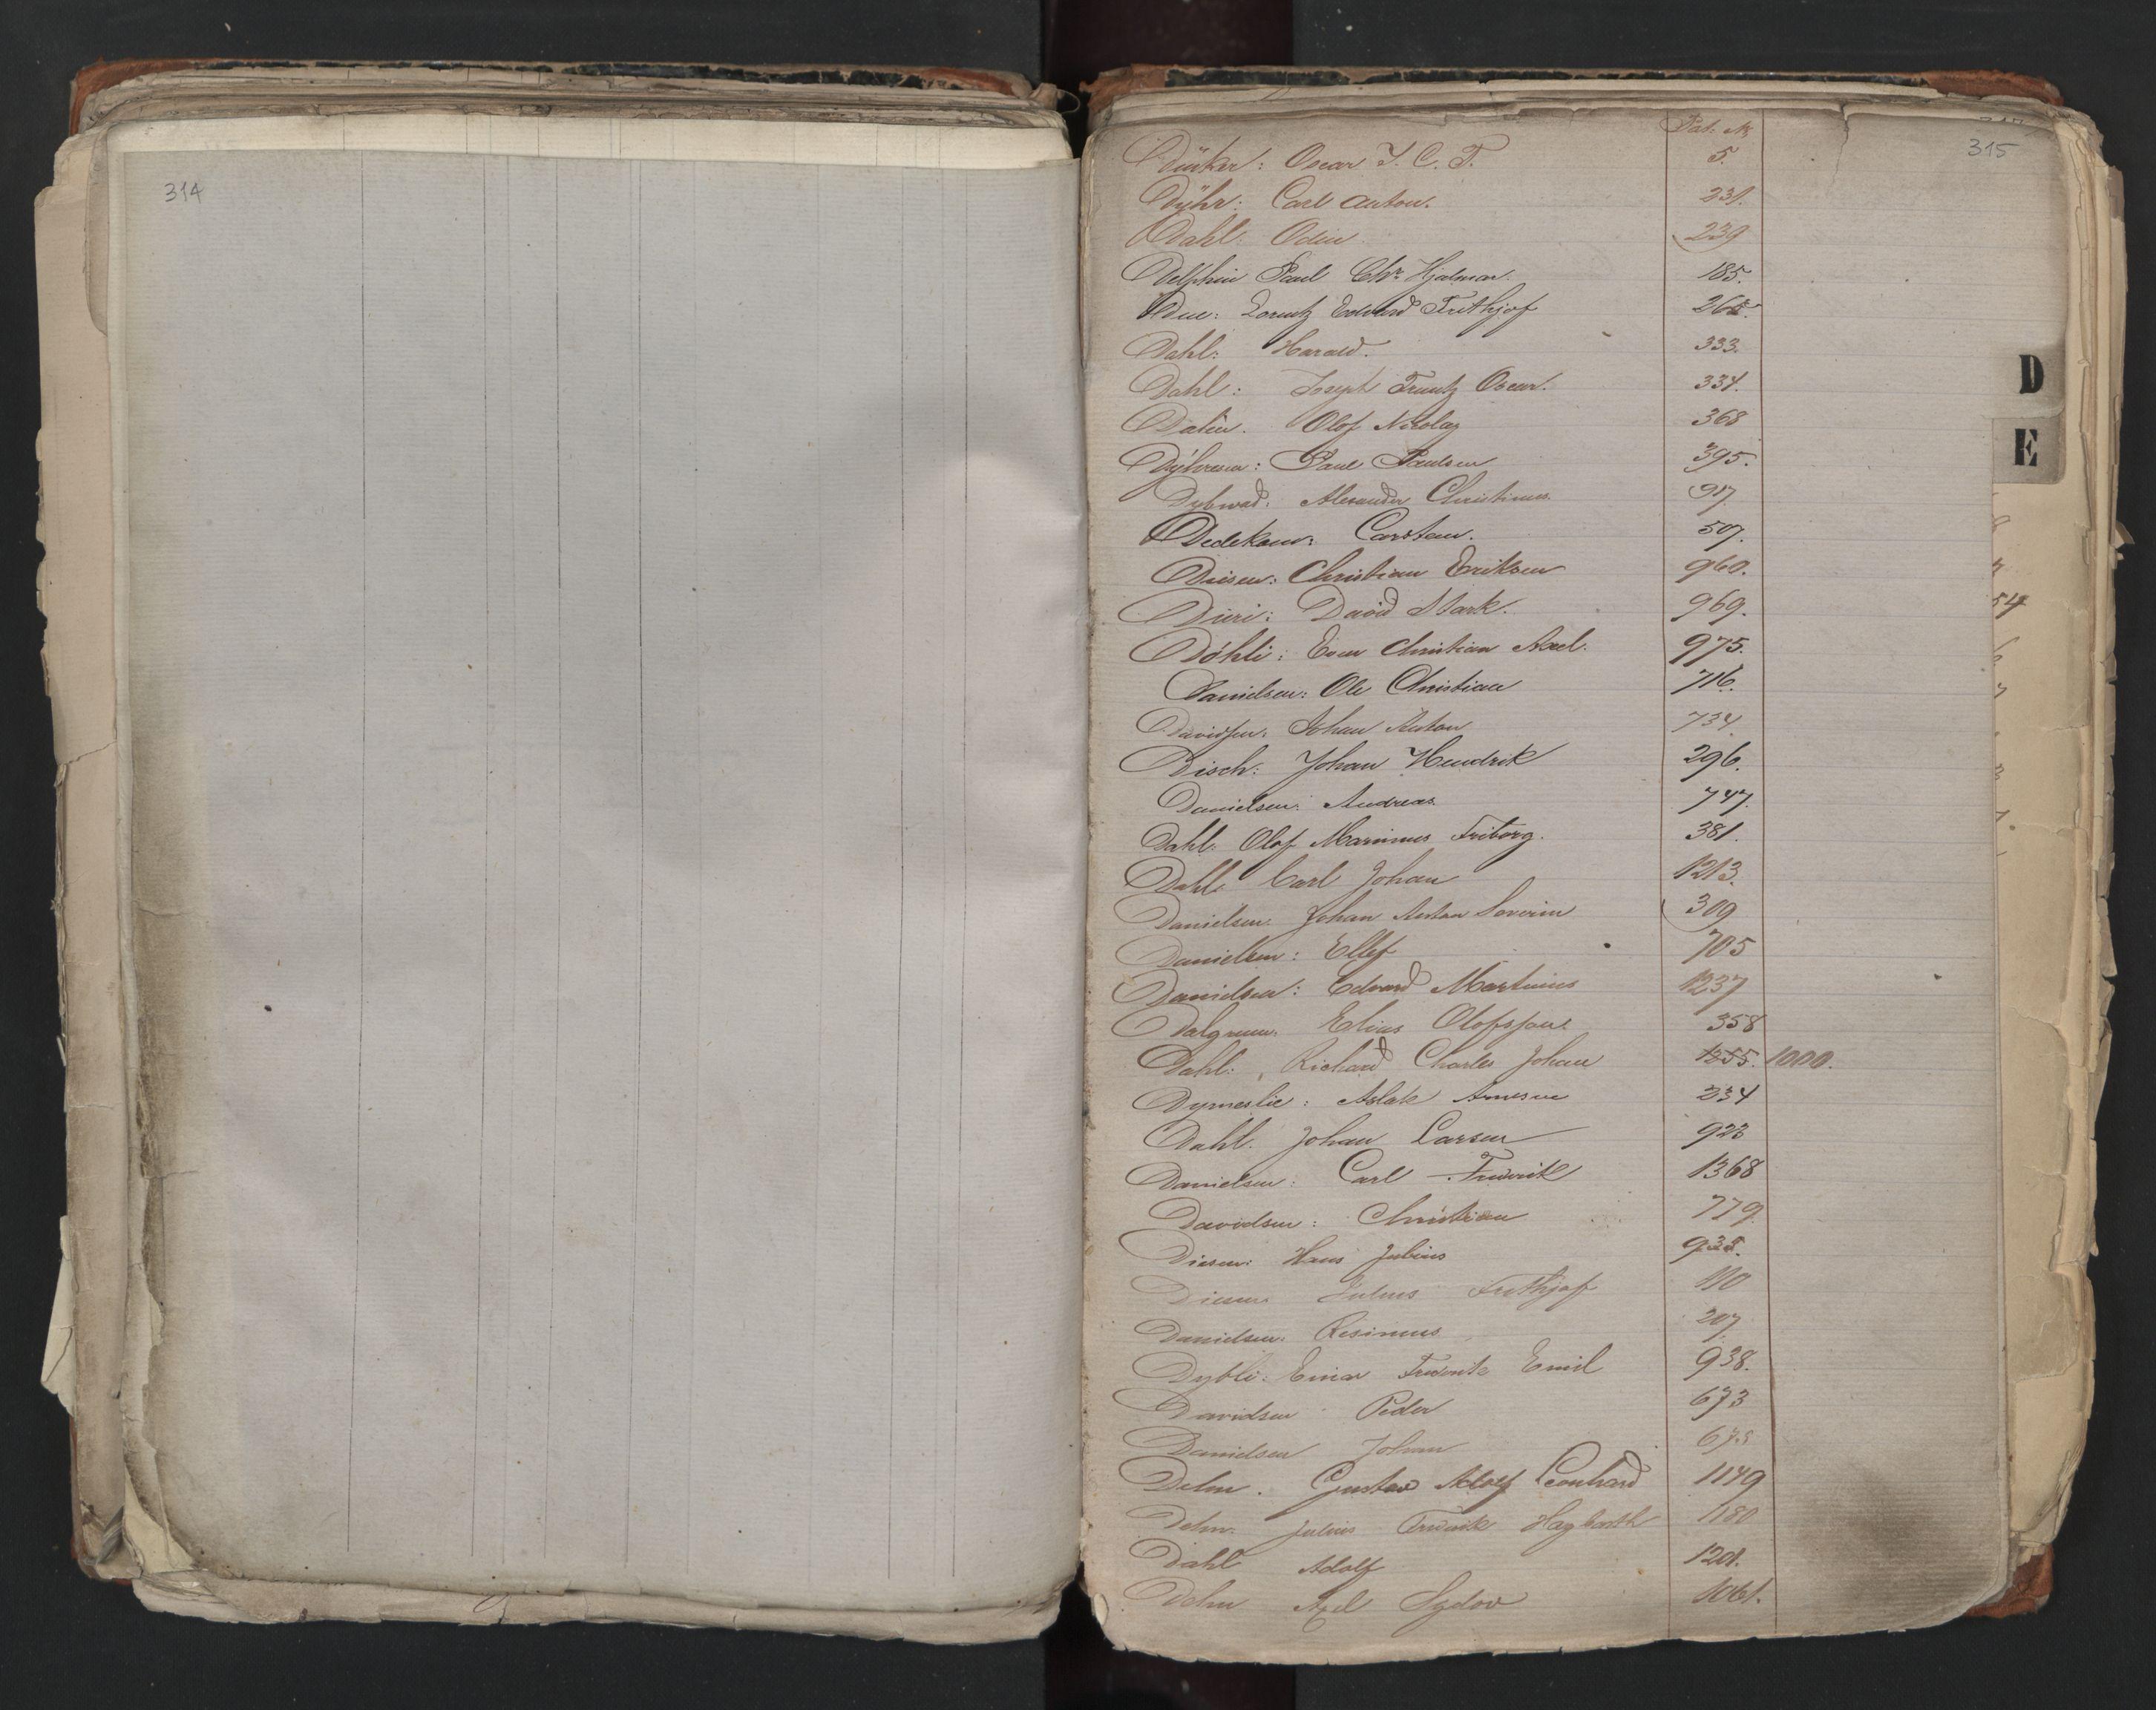 SAO, Oslo sjømannskontor, F/Fa/L0001: Register for Kristiania krets, 1866-1891, s. 314-315